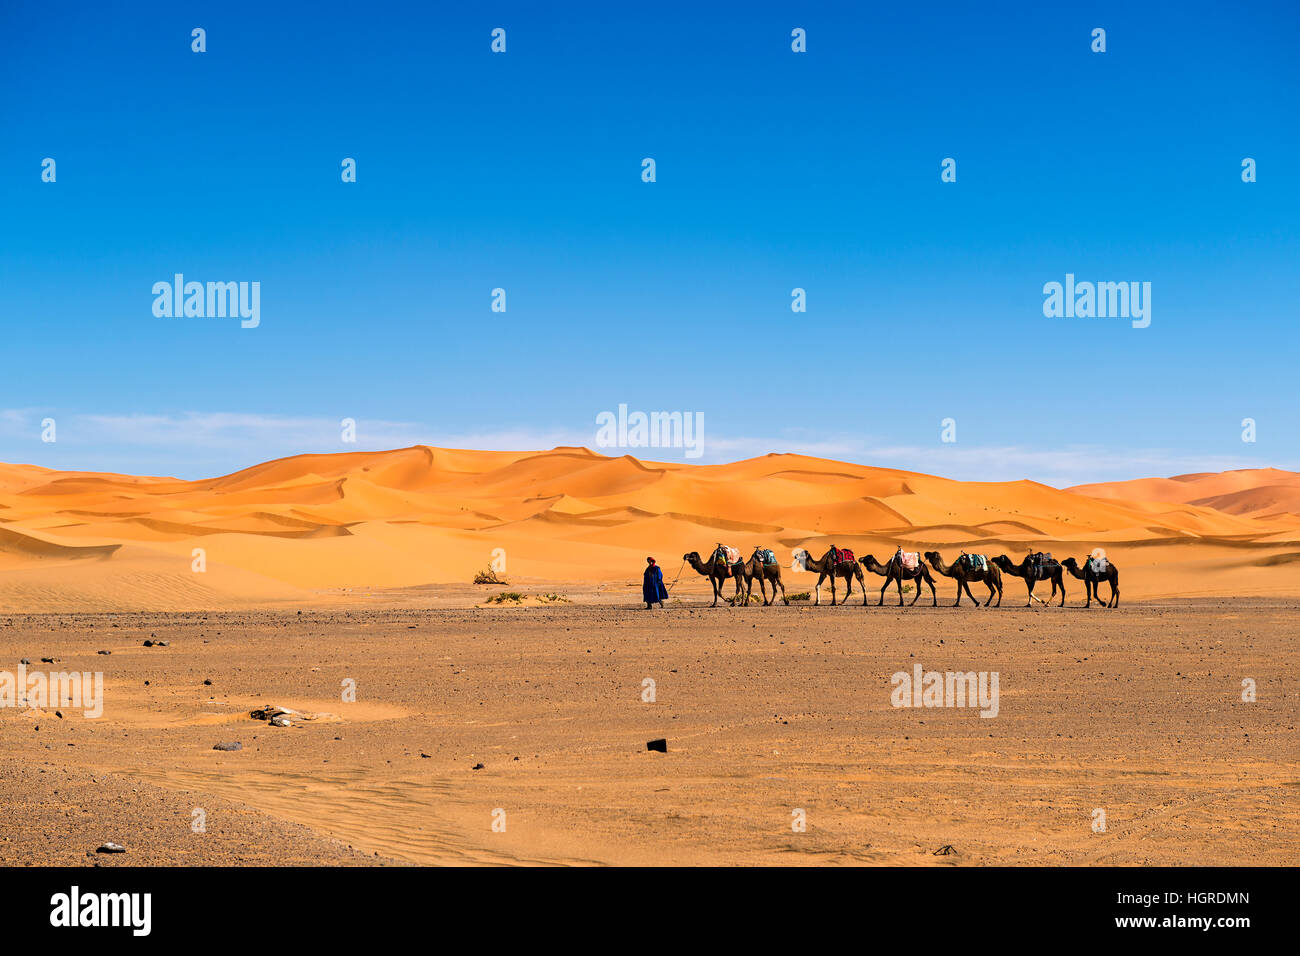 Merzouga, Morocco - April 12, 2016: Berber man leading a camel caravan in the Erg Chebbi dunes in Morocco. - Stock Image